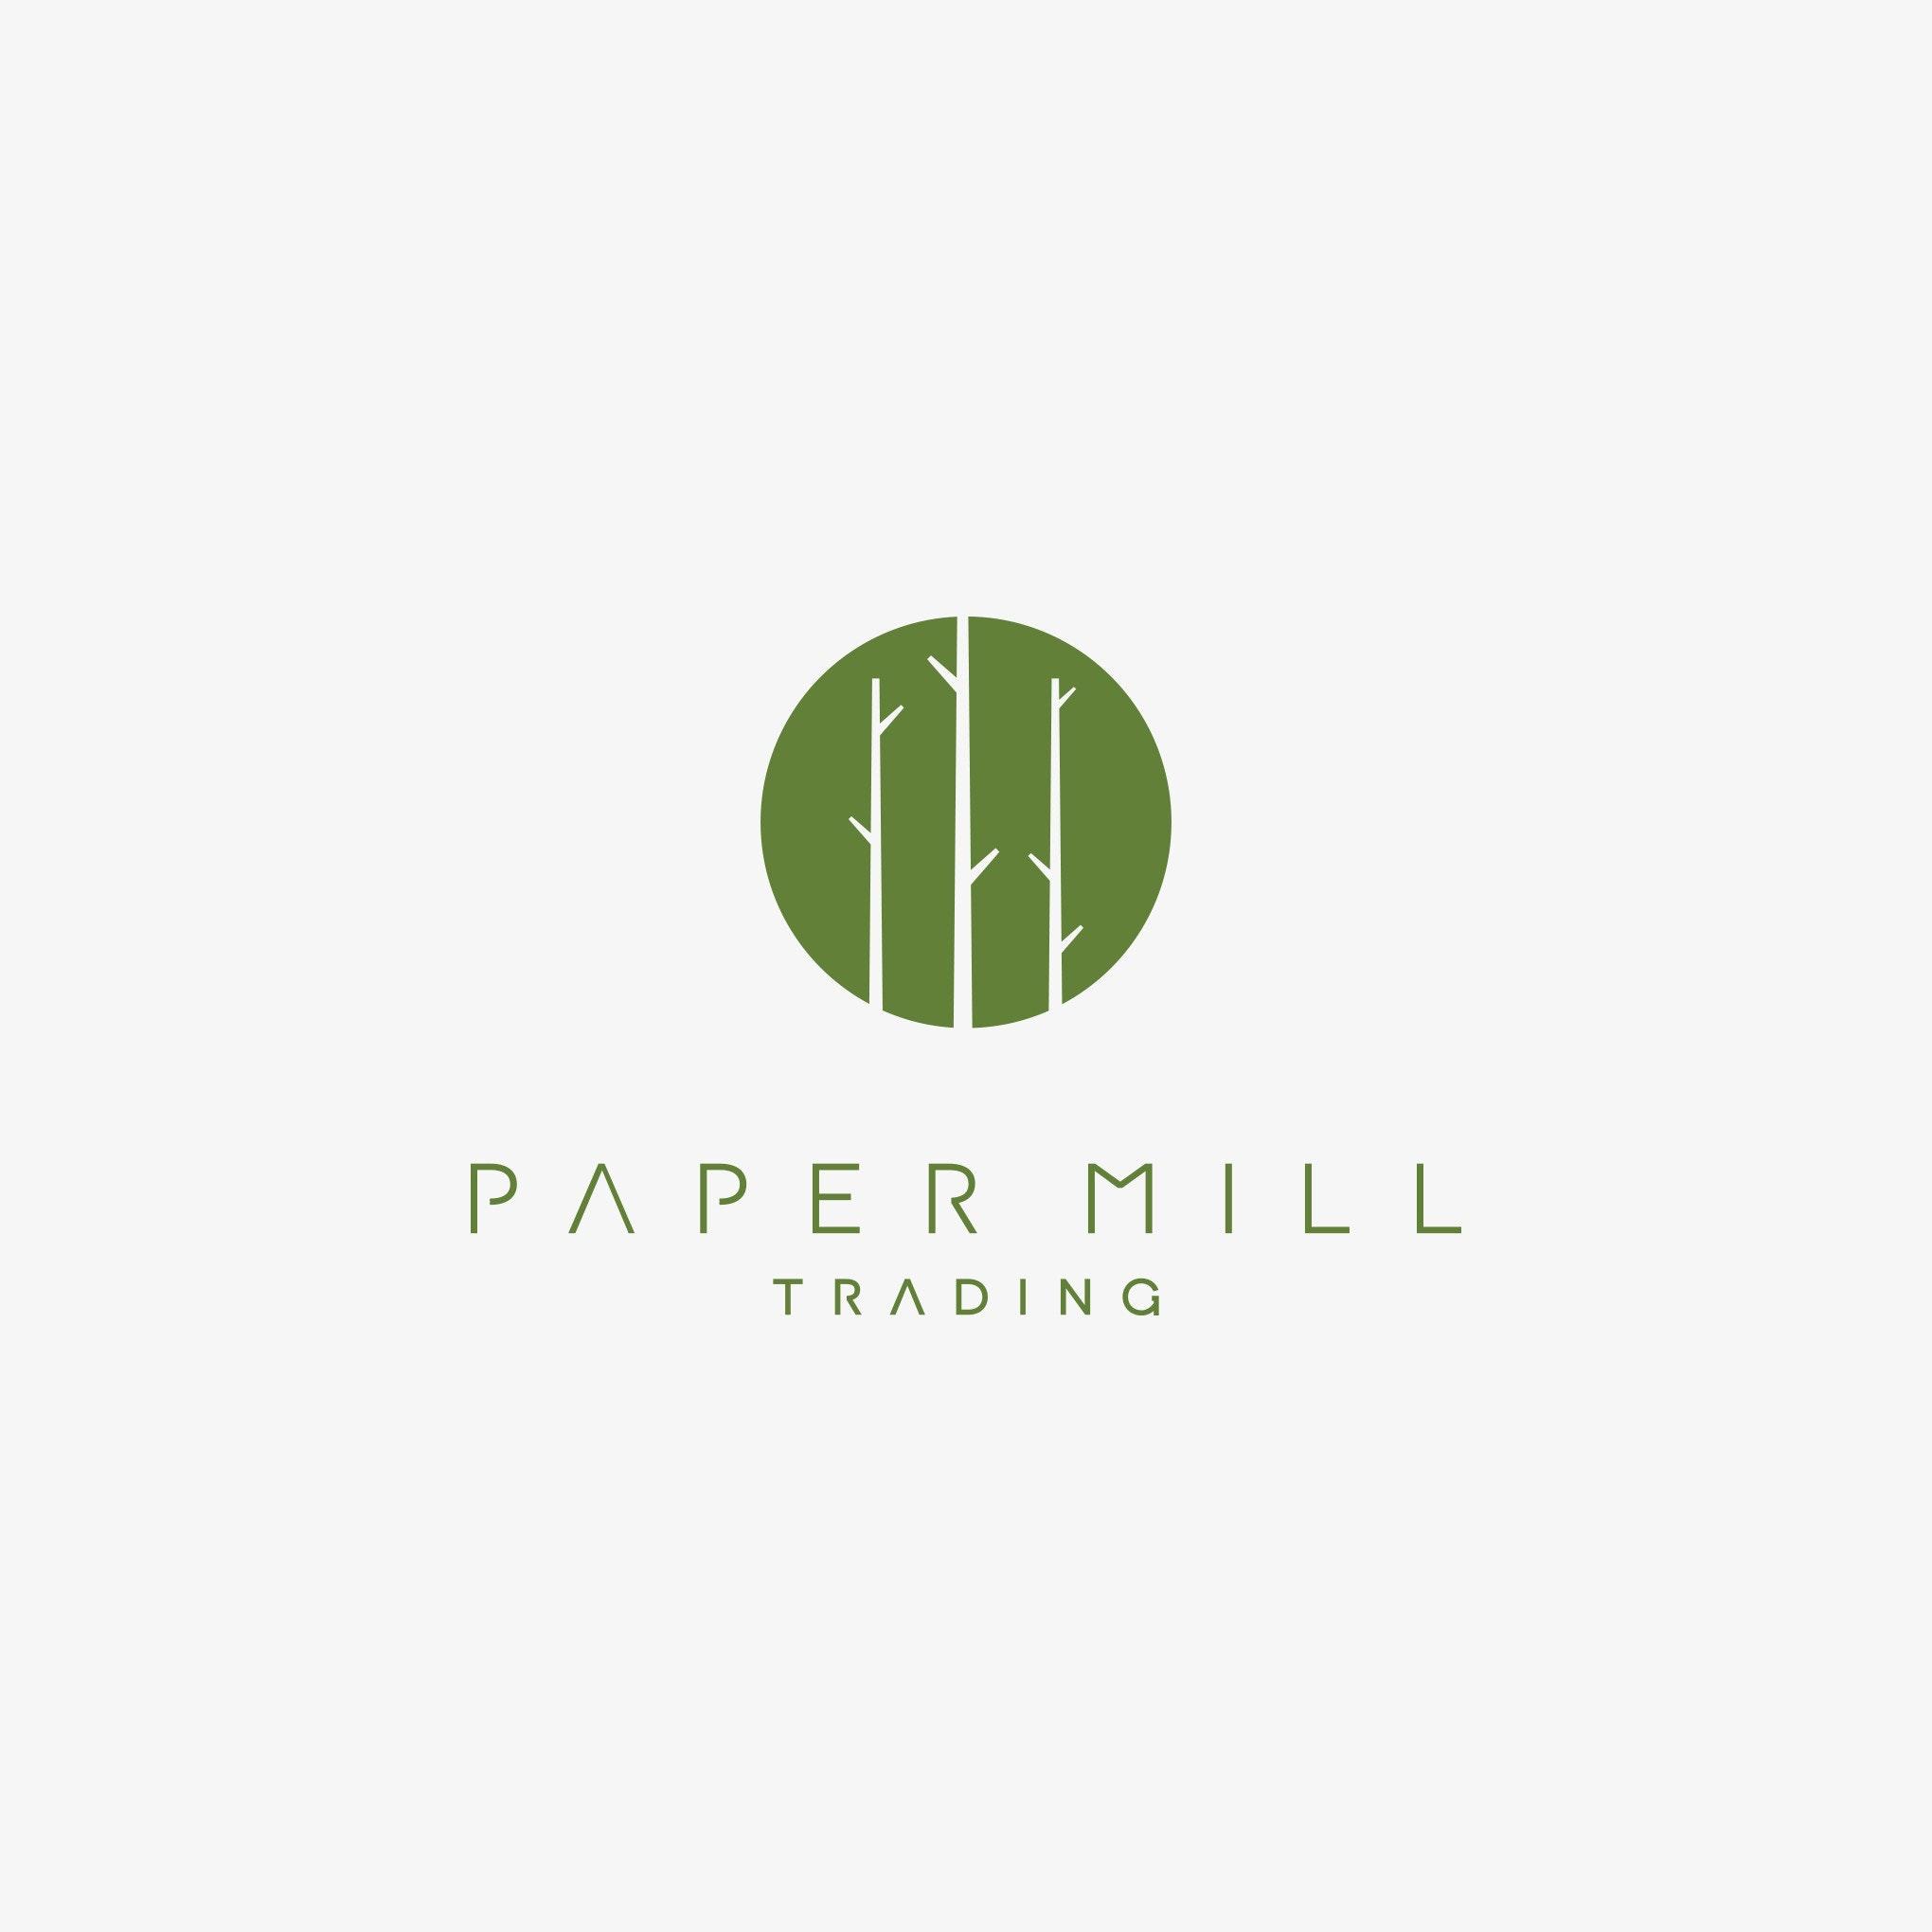 Paper Mill Trading logo